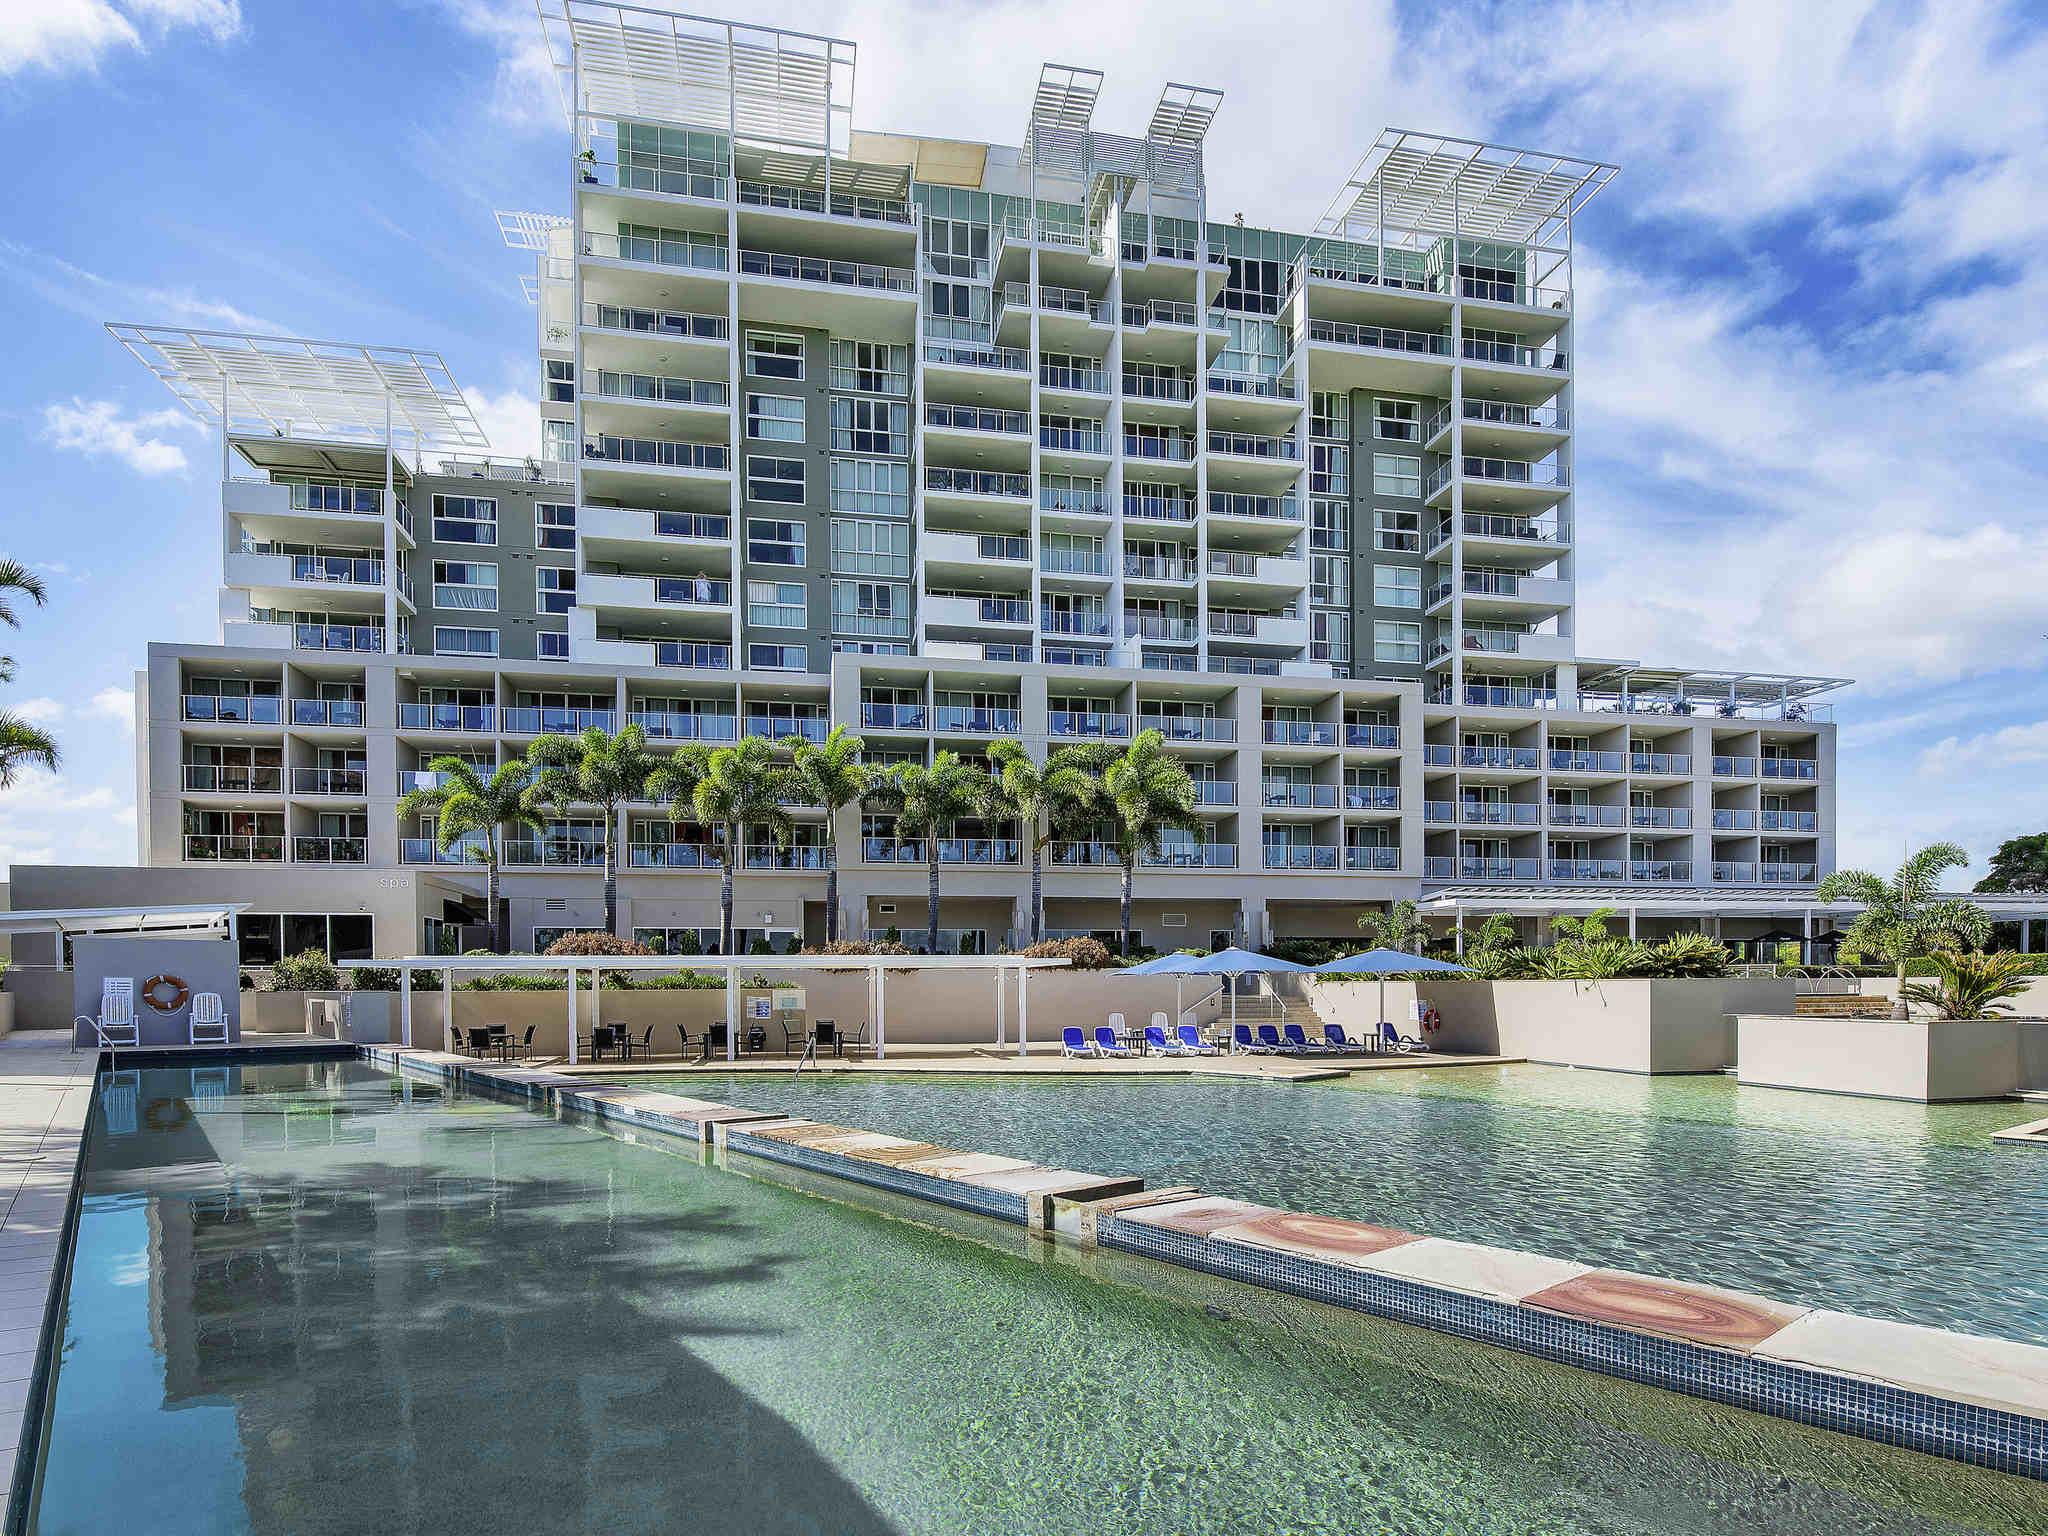 Hotel – The Sebel Pelican Waters Resort